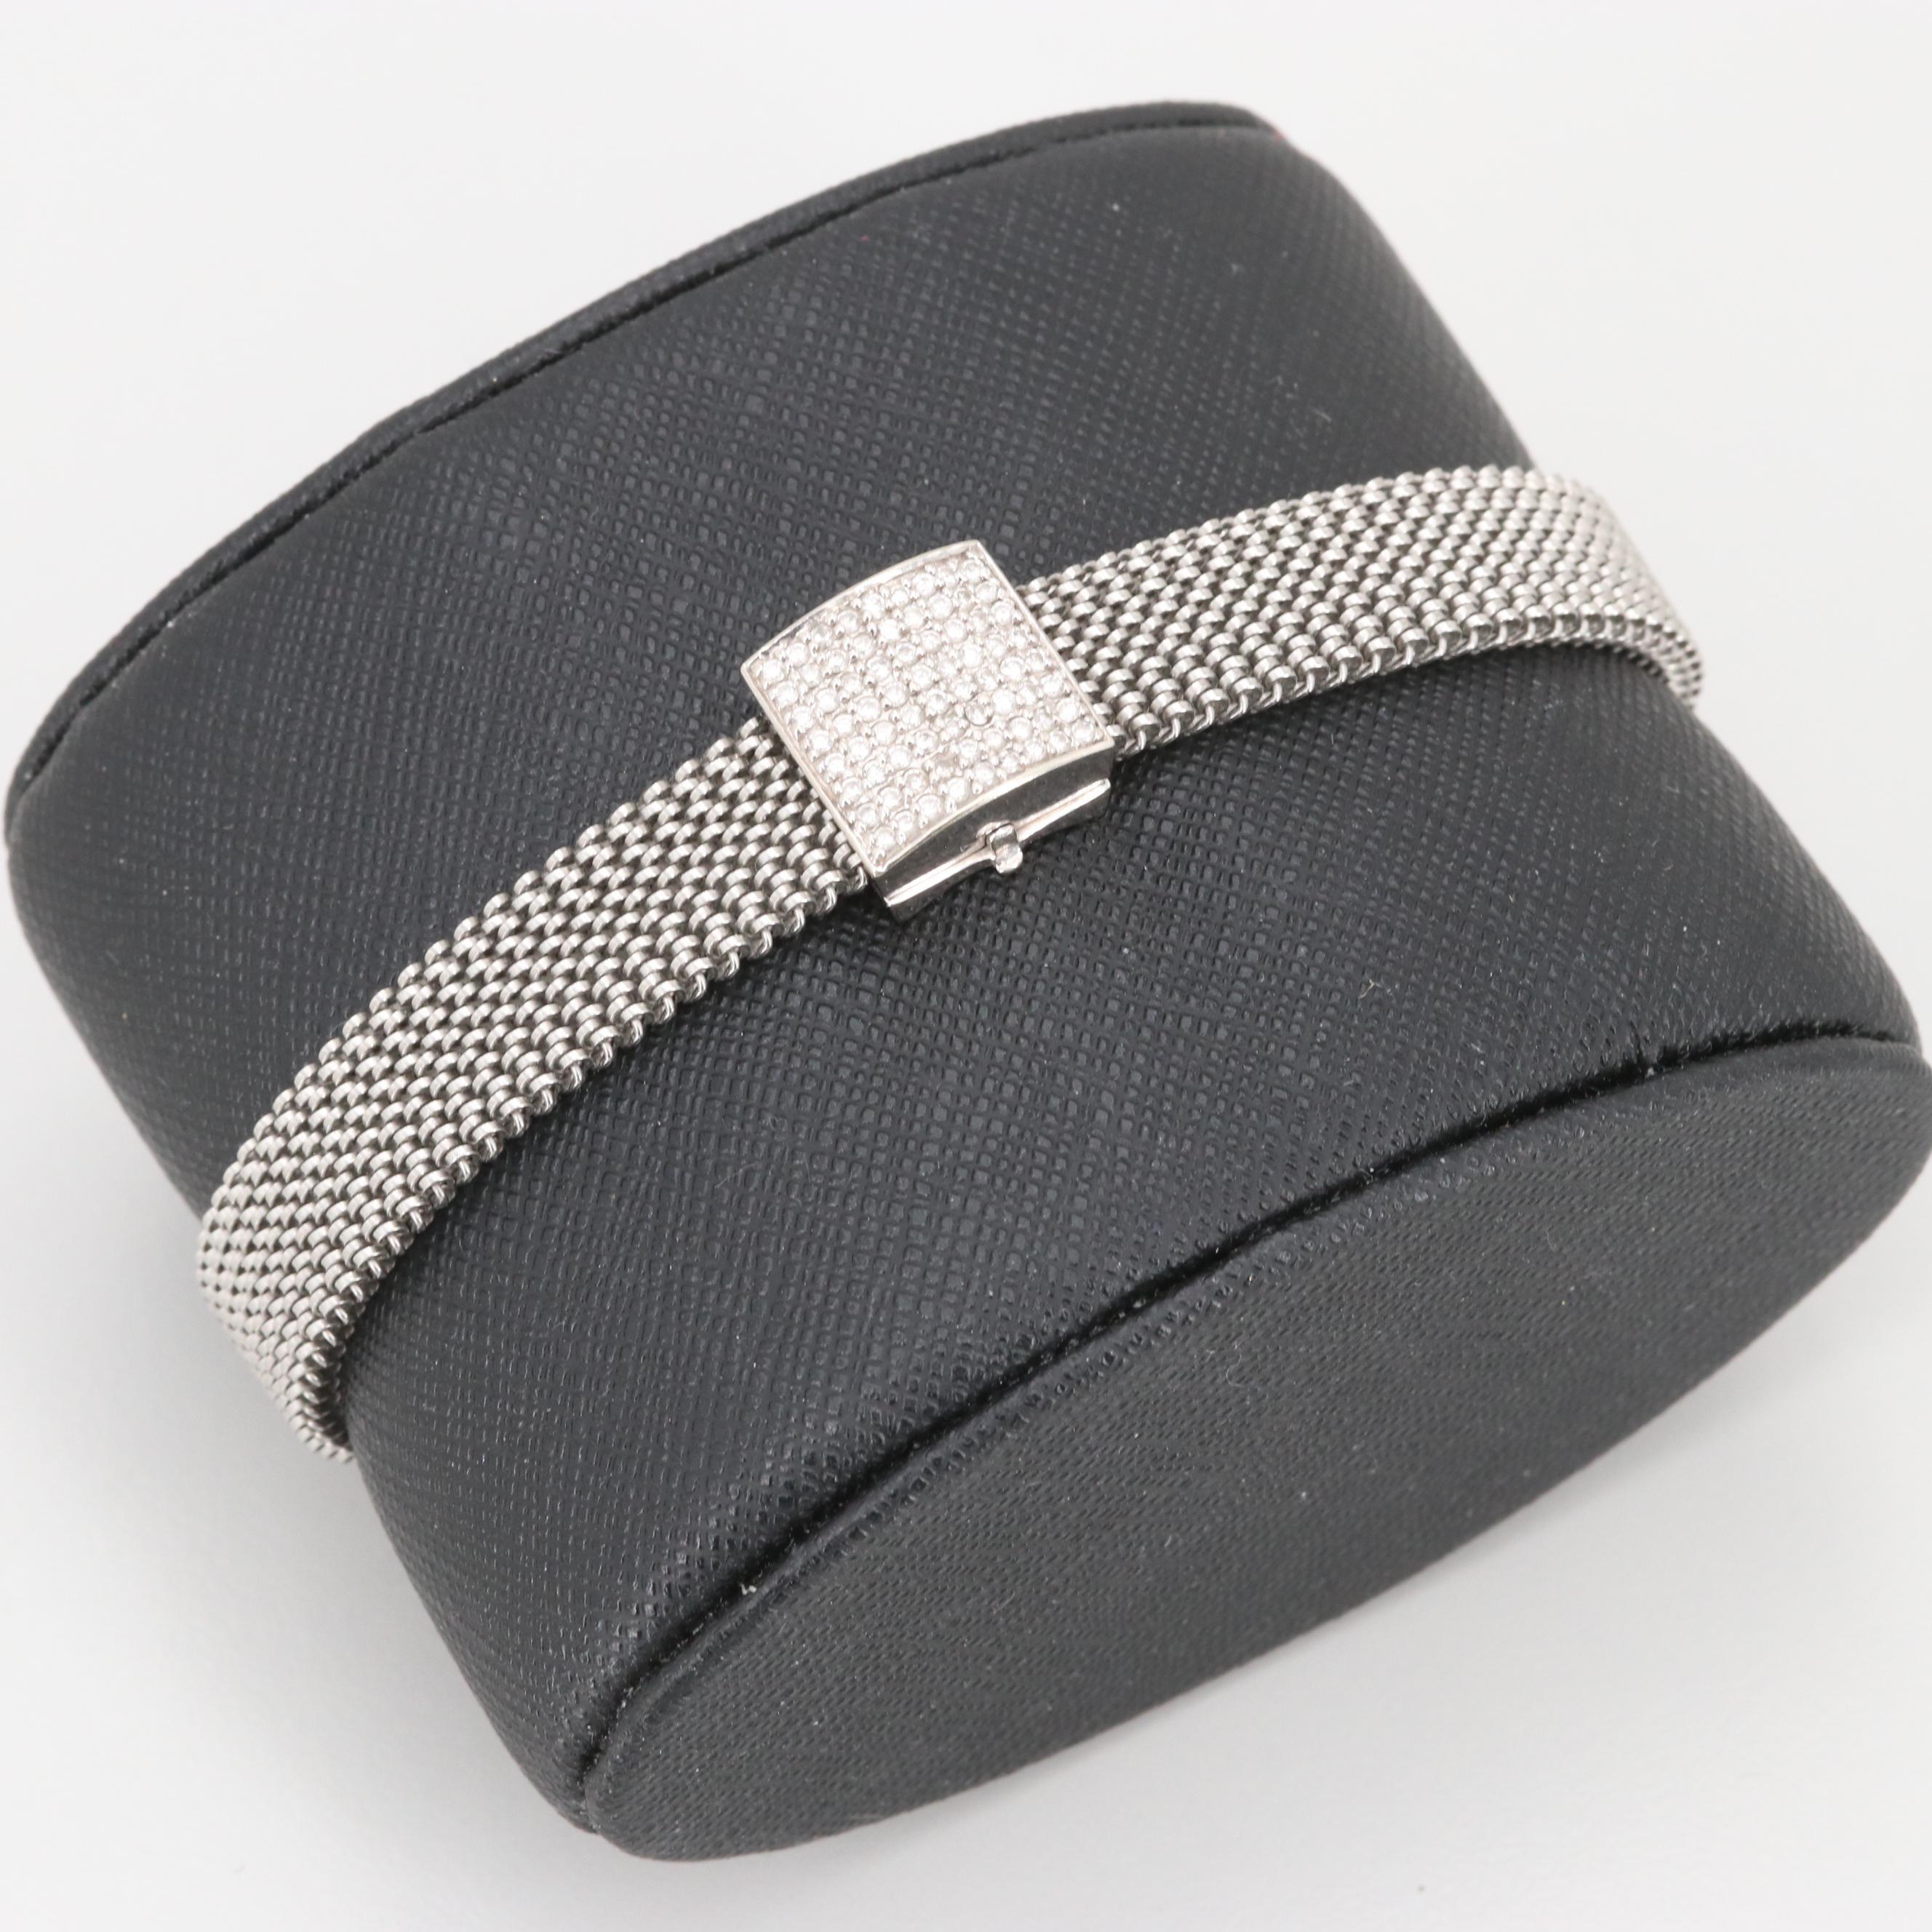 14K White Gold and Silver Tone Diamond Expandable Bracelet